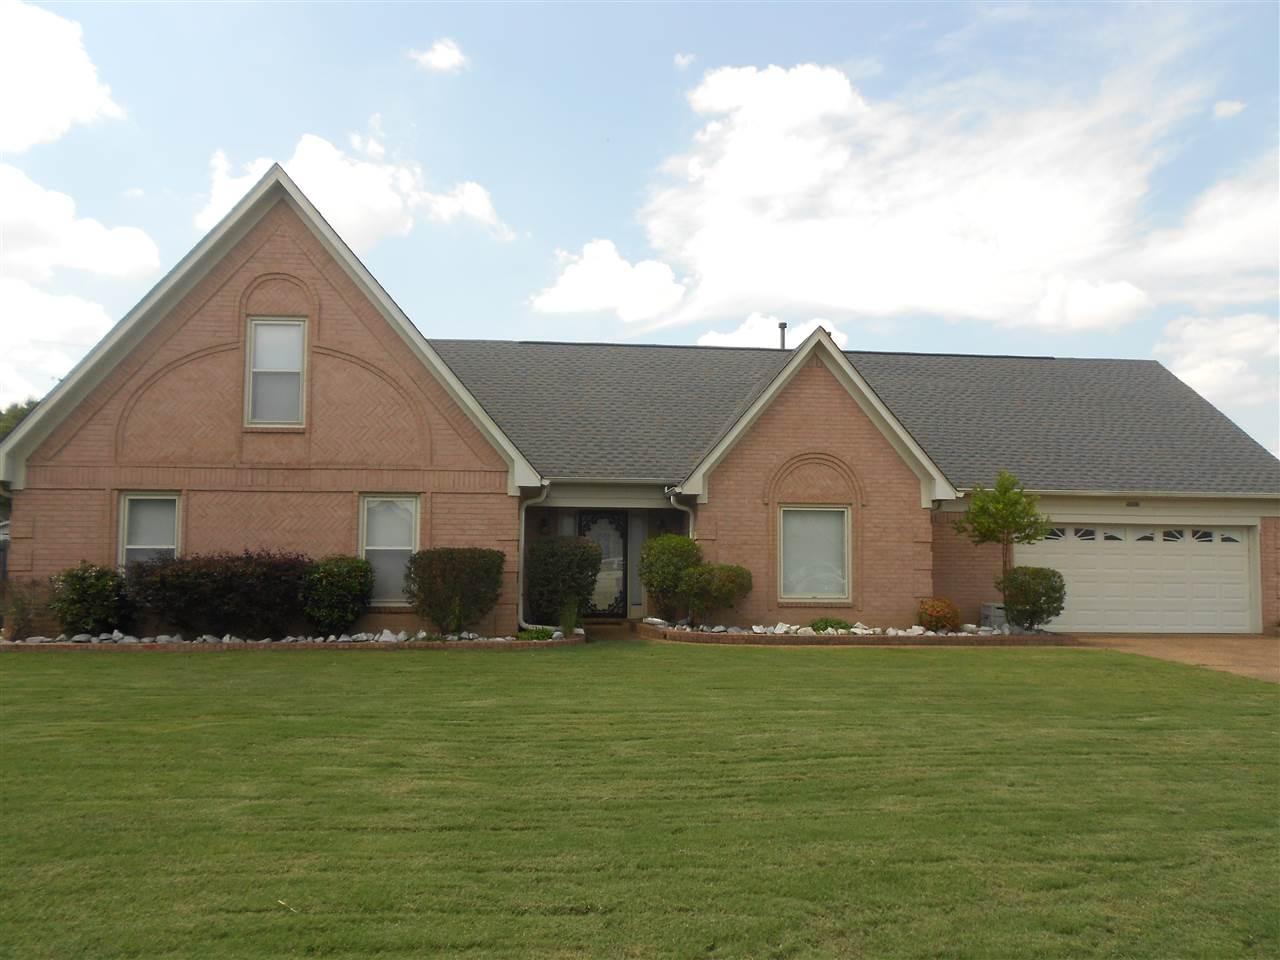 5003 Horizon Memphis, TN 38125 - MLS #: 10011473